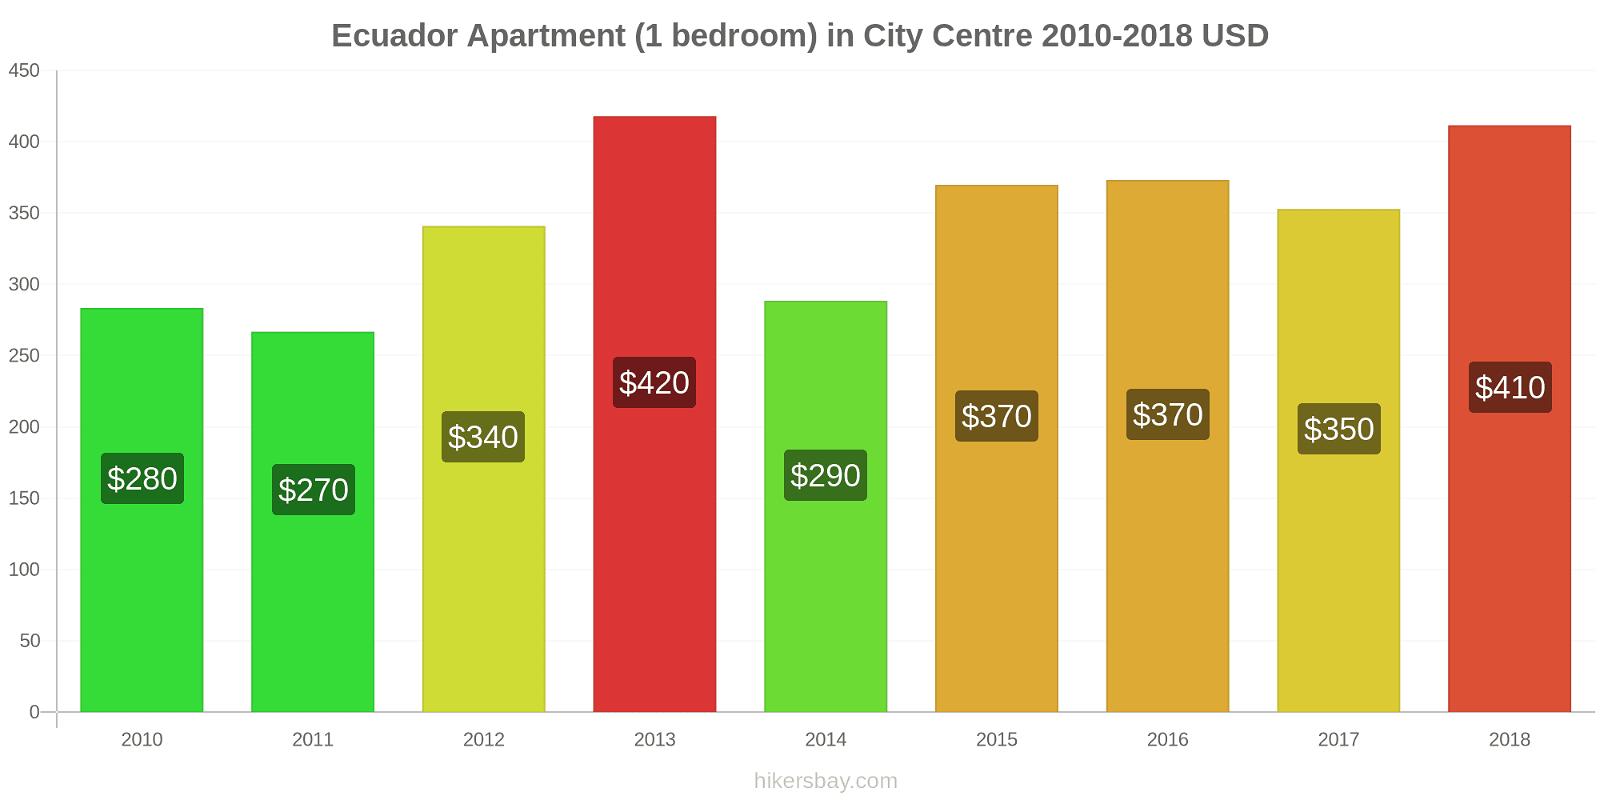 Ecuador price changes Apartment (1 bedroom) in City Centre hikersbay.com